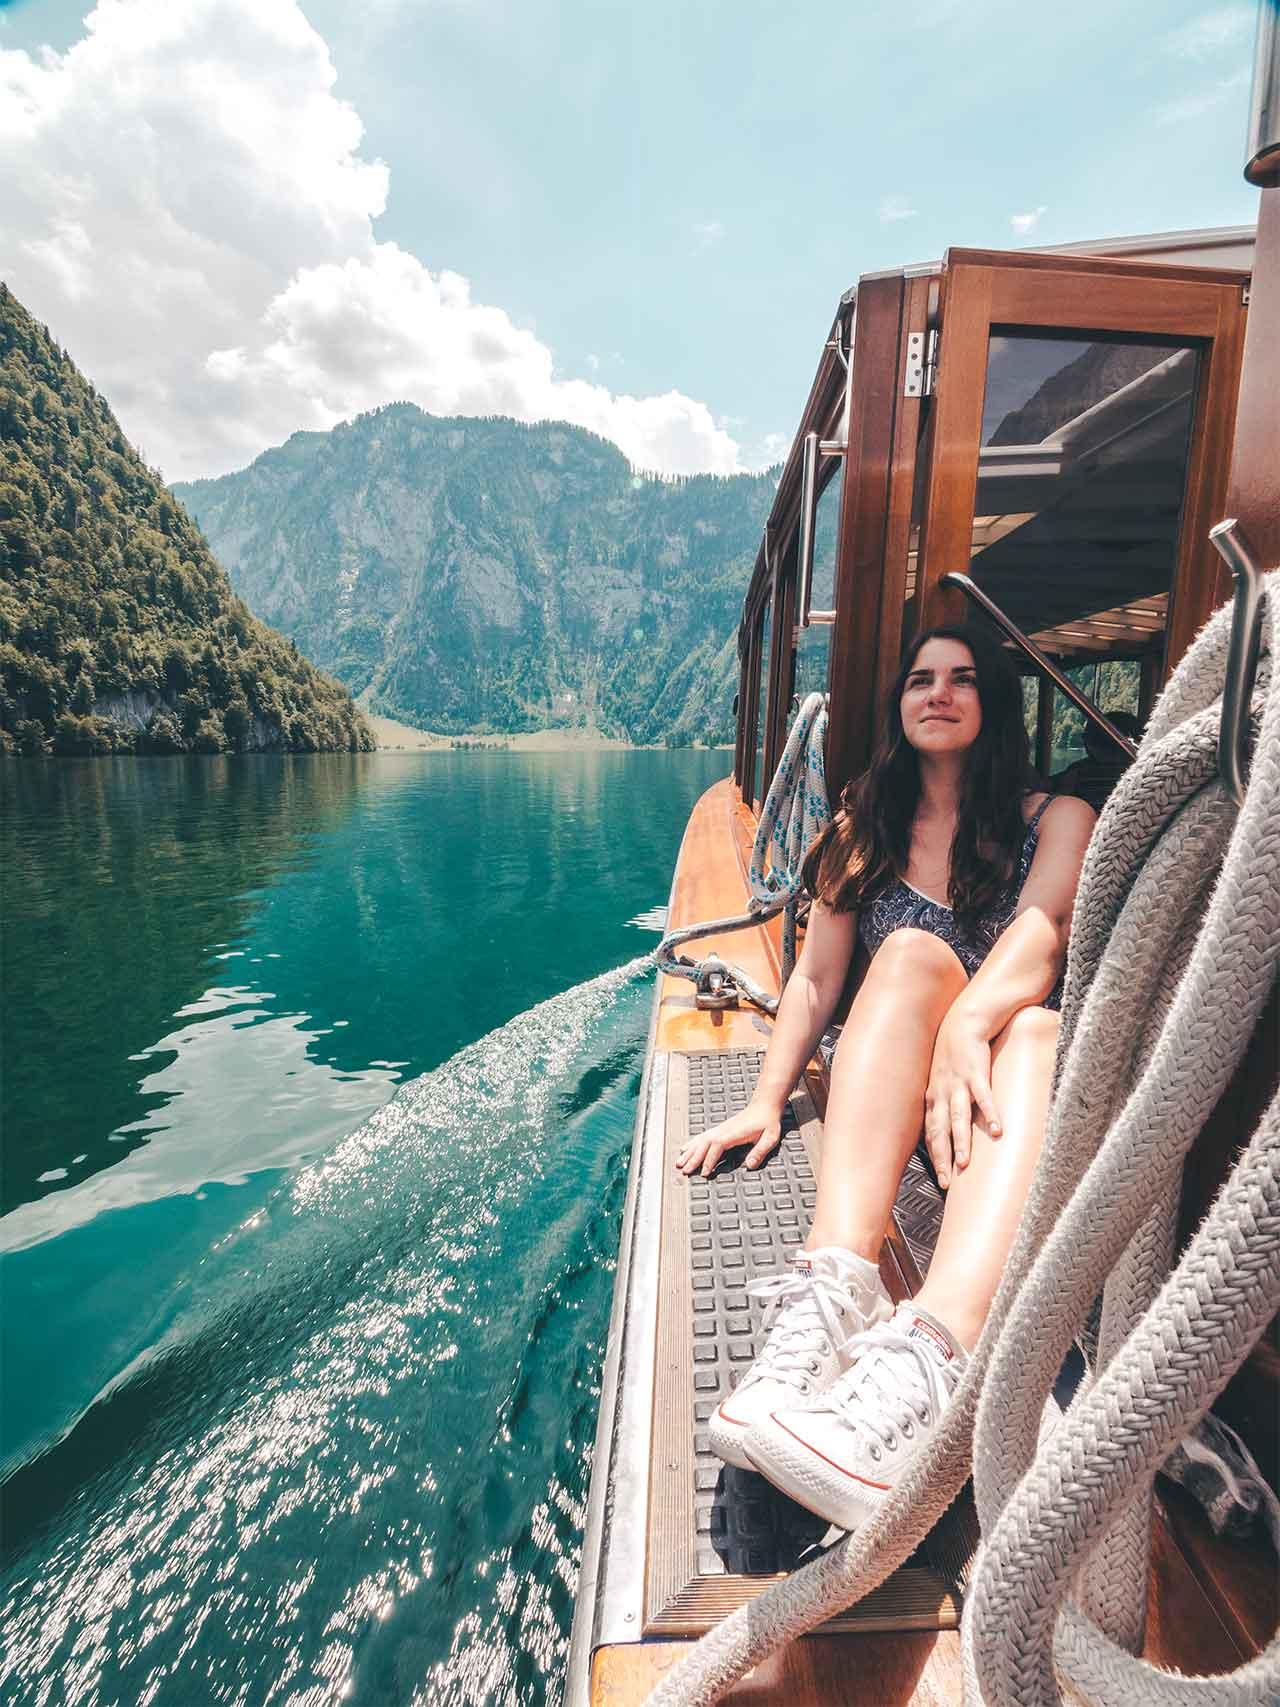 Jasmin auf dem Elektroboot am Königssee